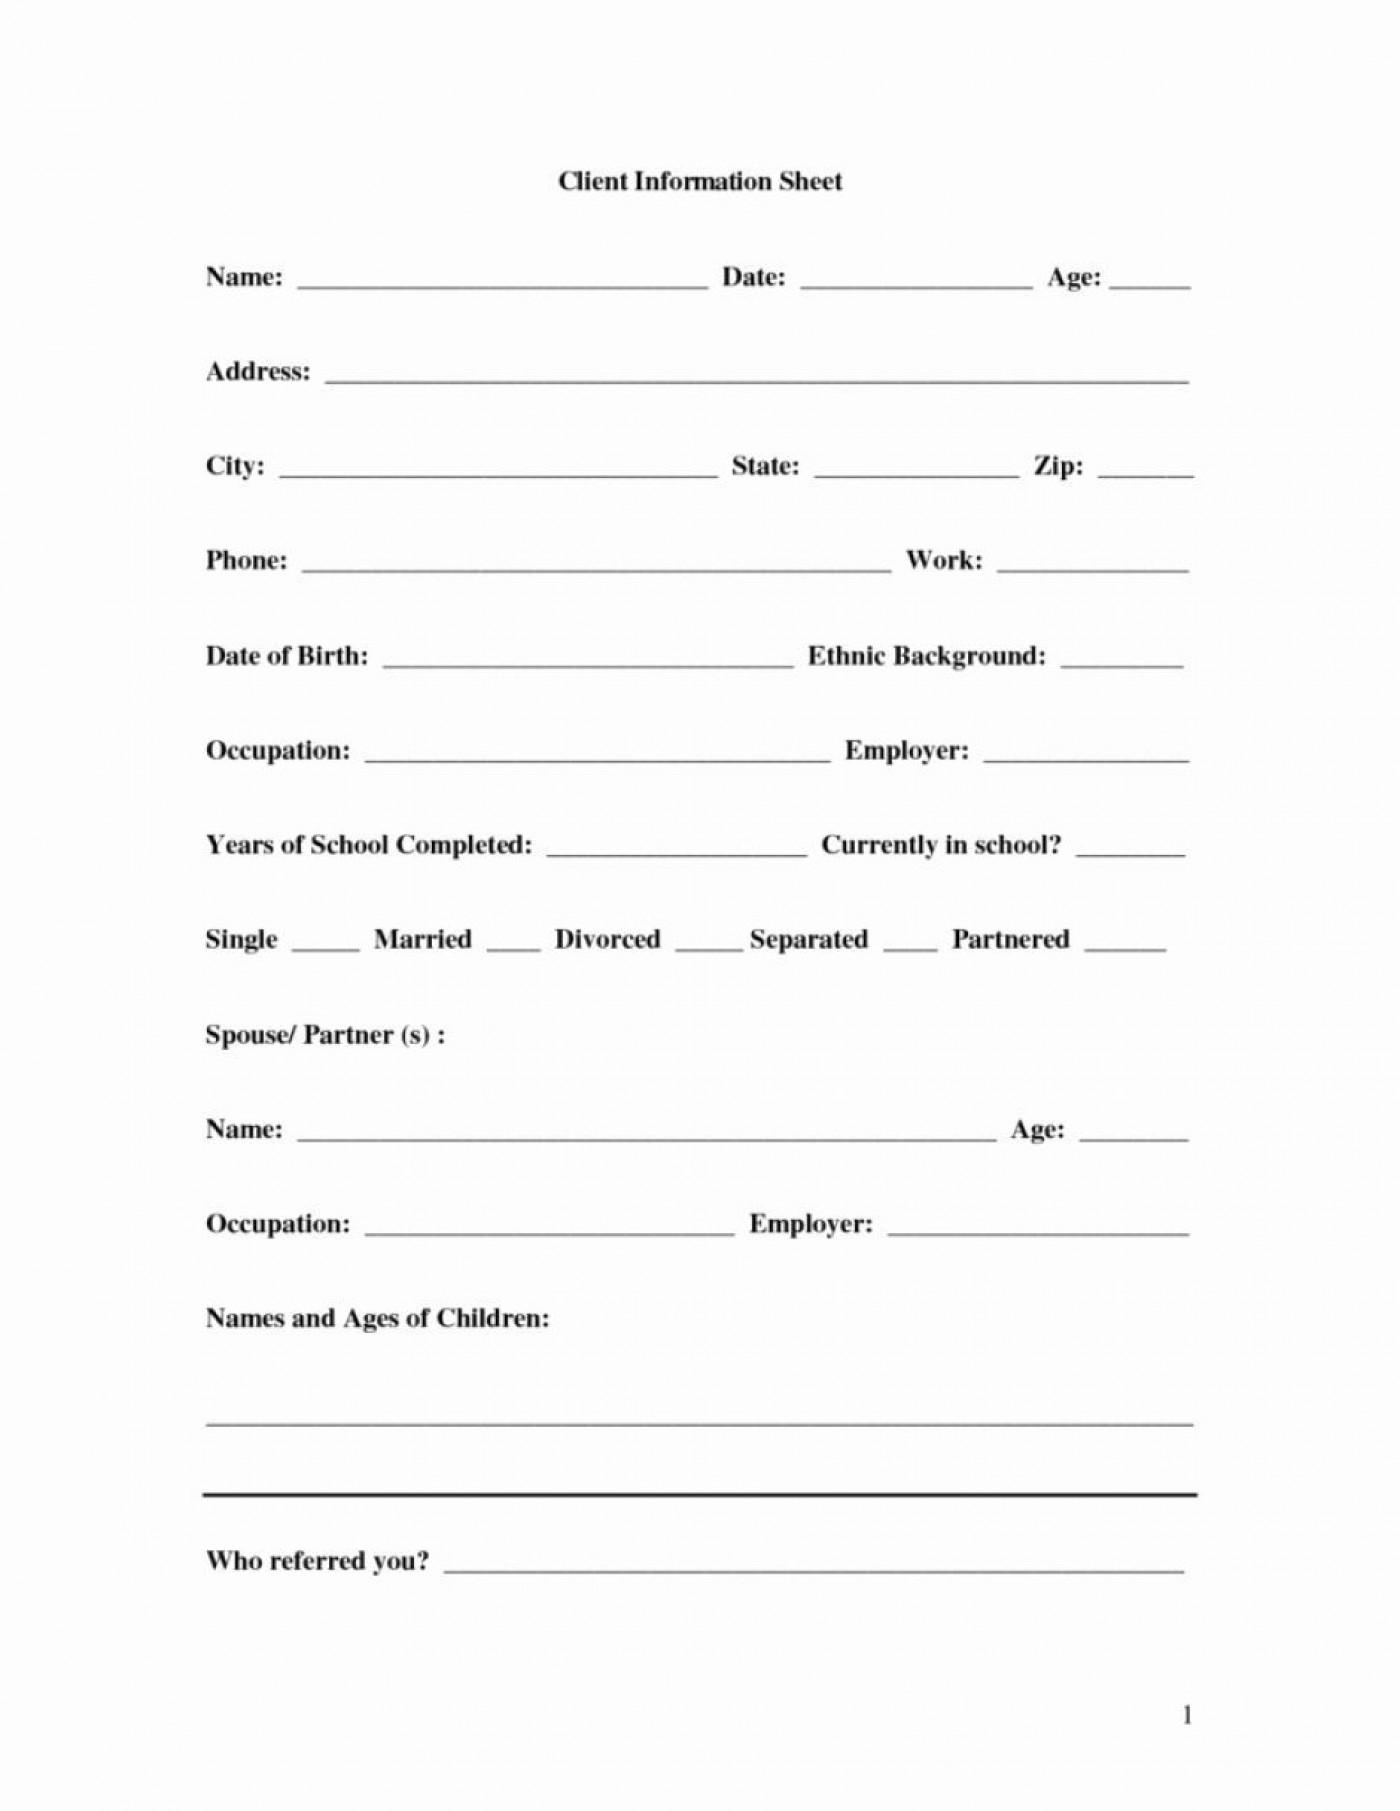 001 Unbelievable Client Information Form Template Excel Highest Clarity 1400